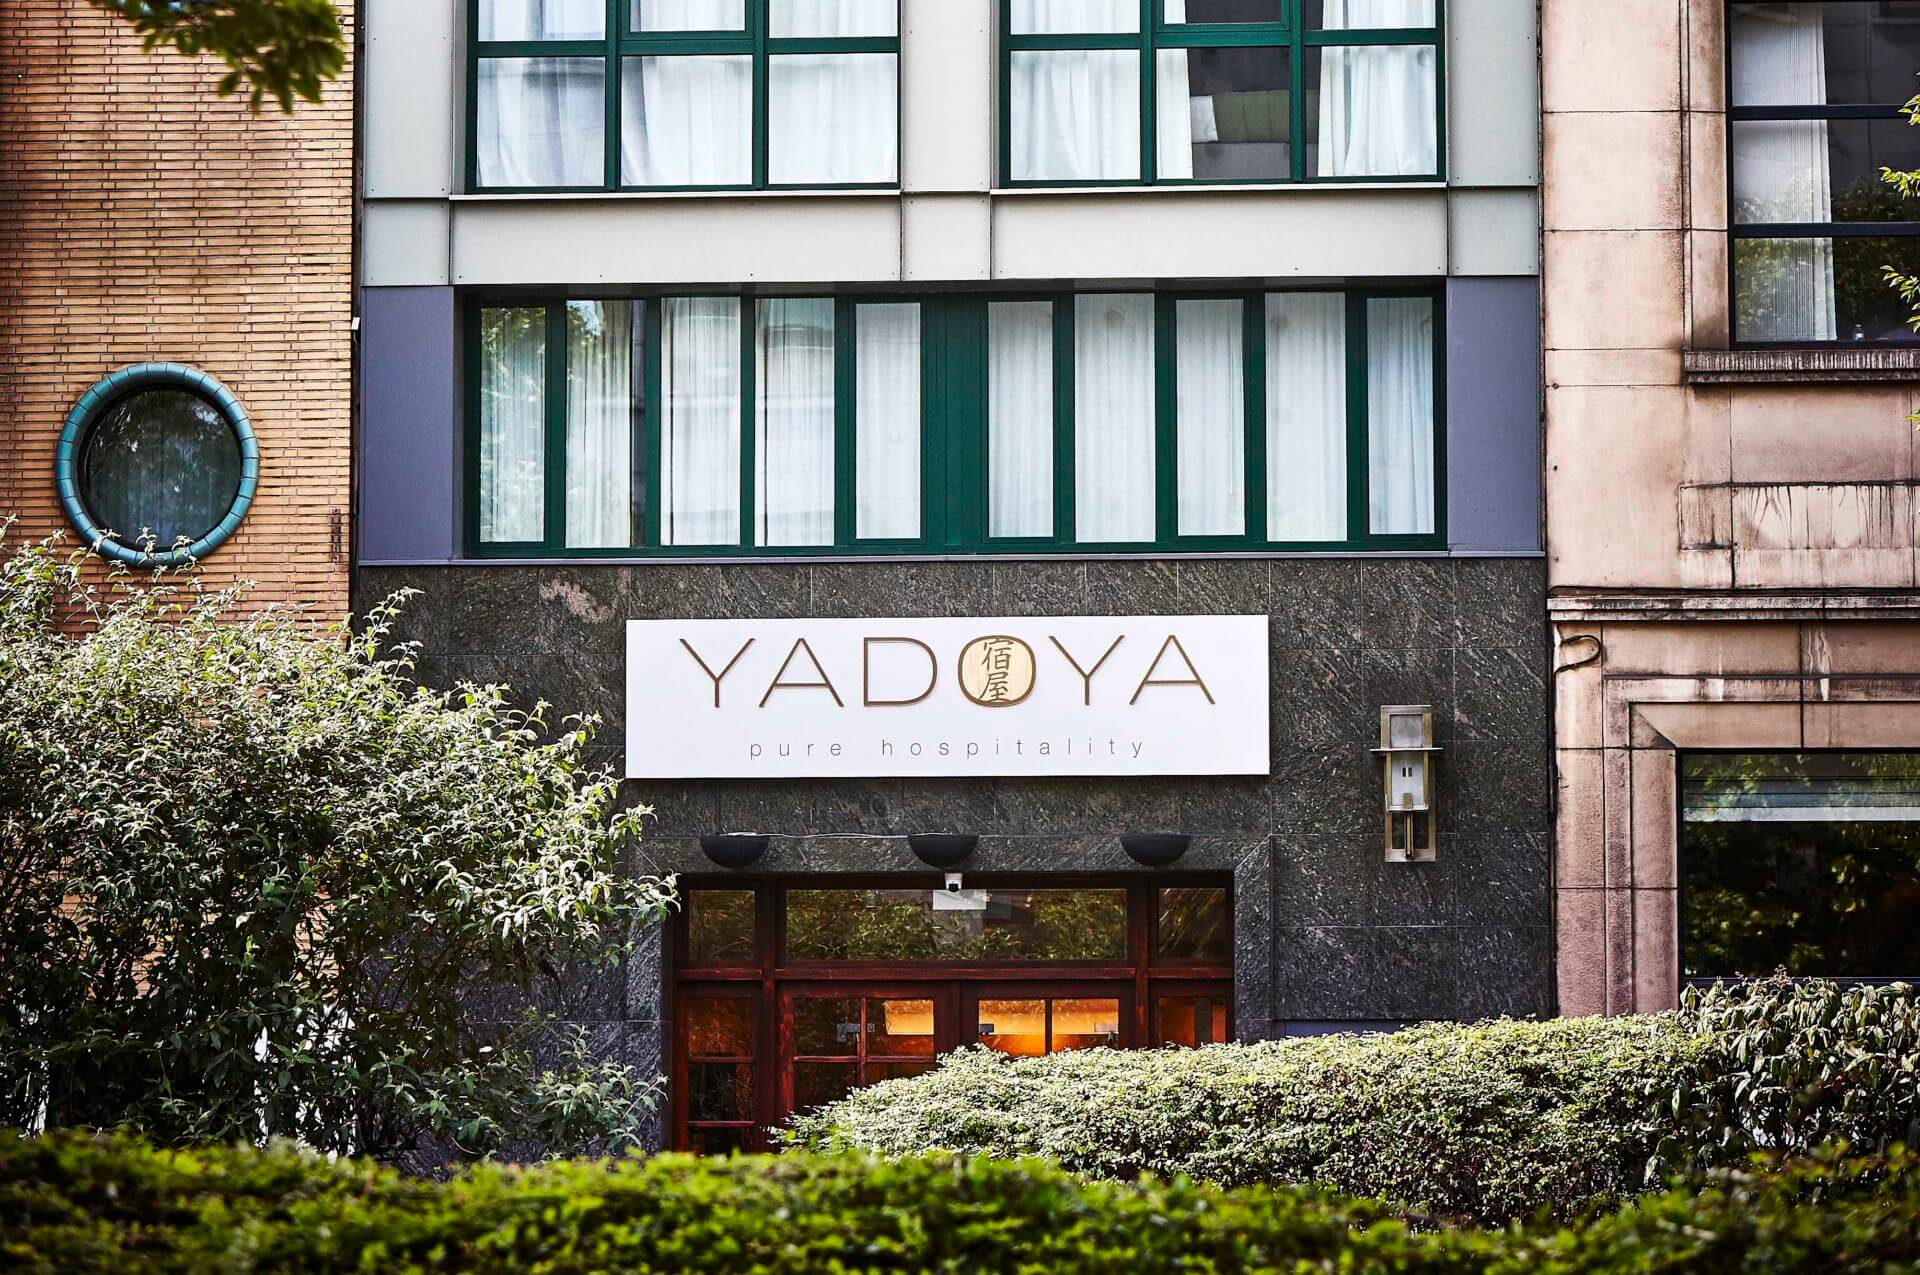 Phicap Hôtel Yadoya